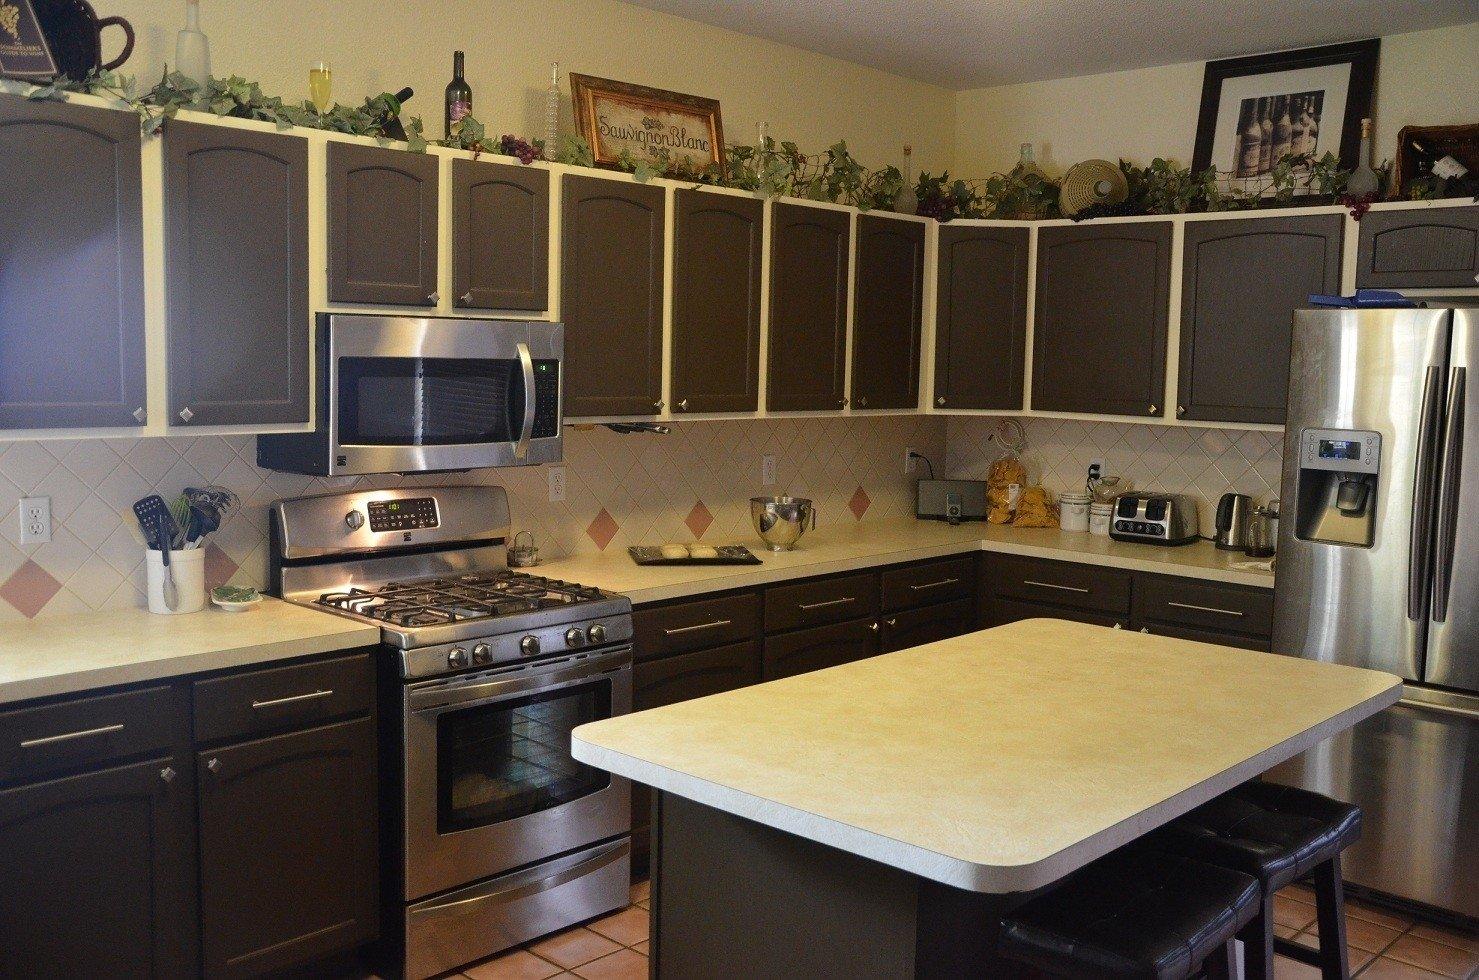 10 Best Kitchen Remodeling Ideas On A Budget captivating kitchen remodeling ideas on a budget inexpensive kitchen 1 2021